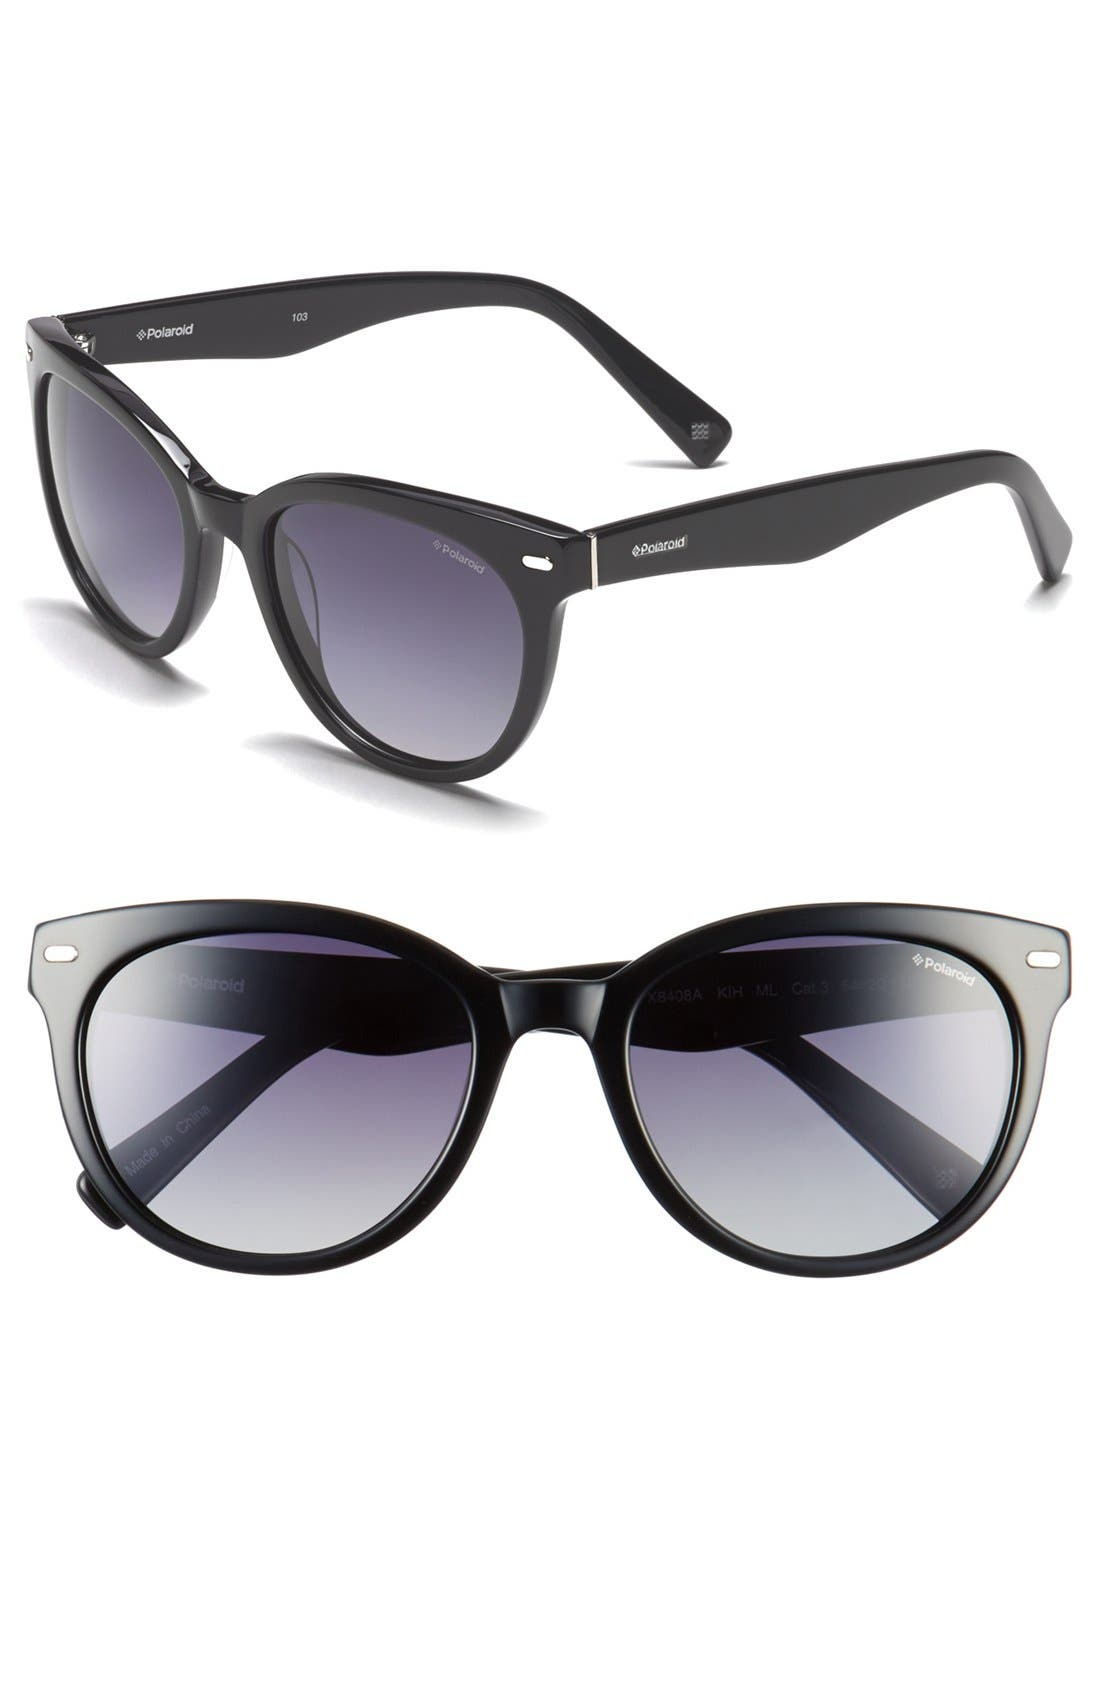 Eyewear 54mm Retro Polarized Sunglasses,                         Main,                         color, Black